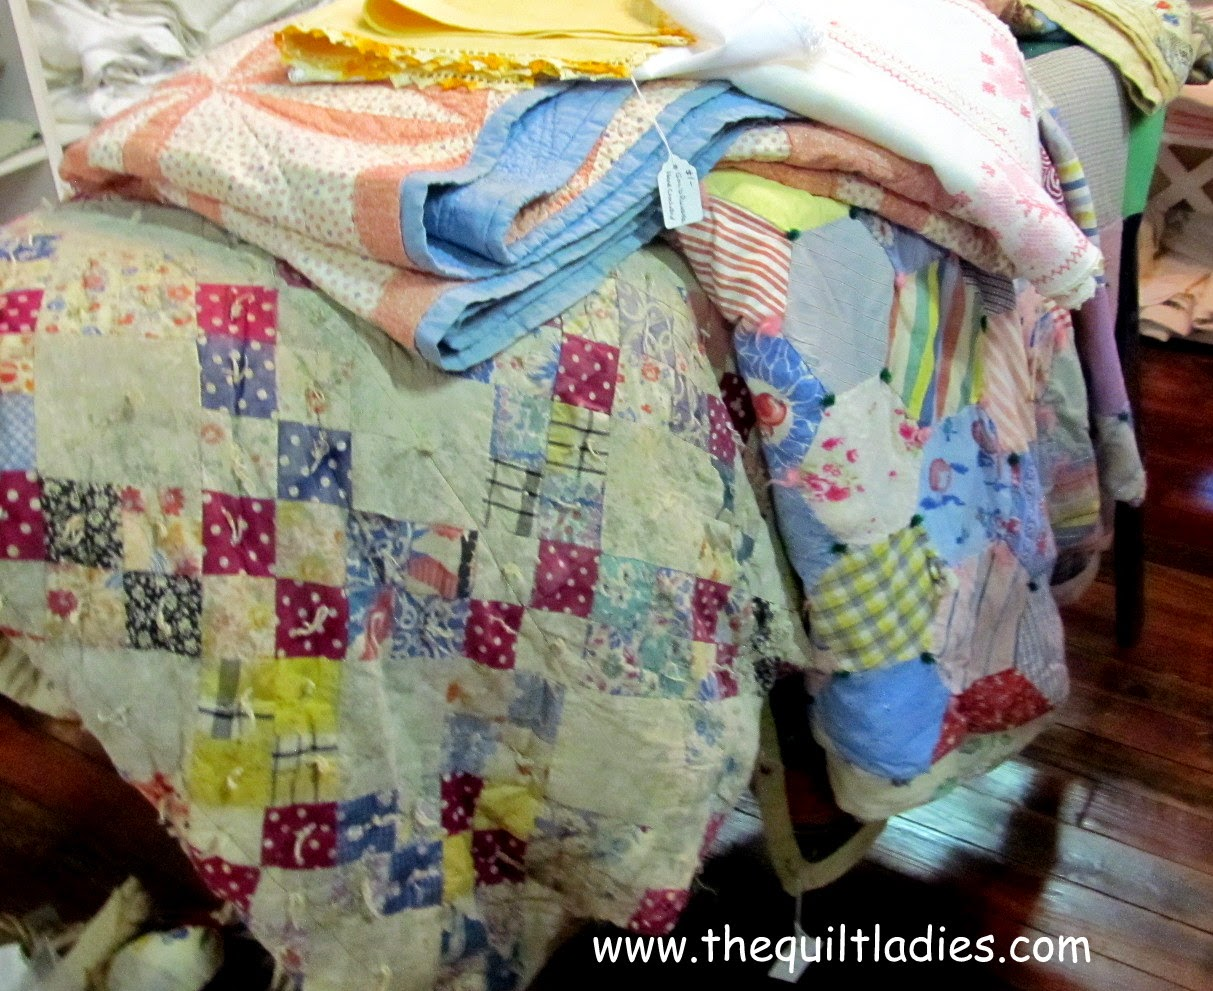 Quilts in Arcadia, Florida